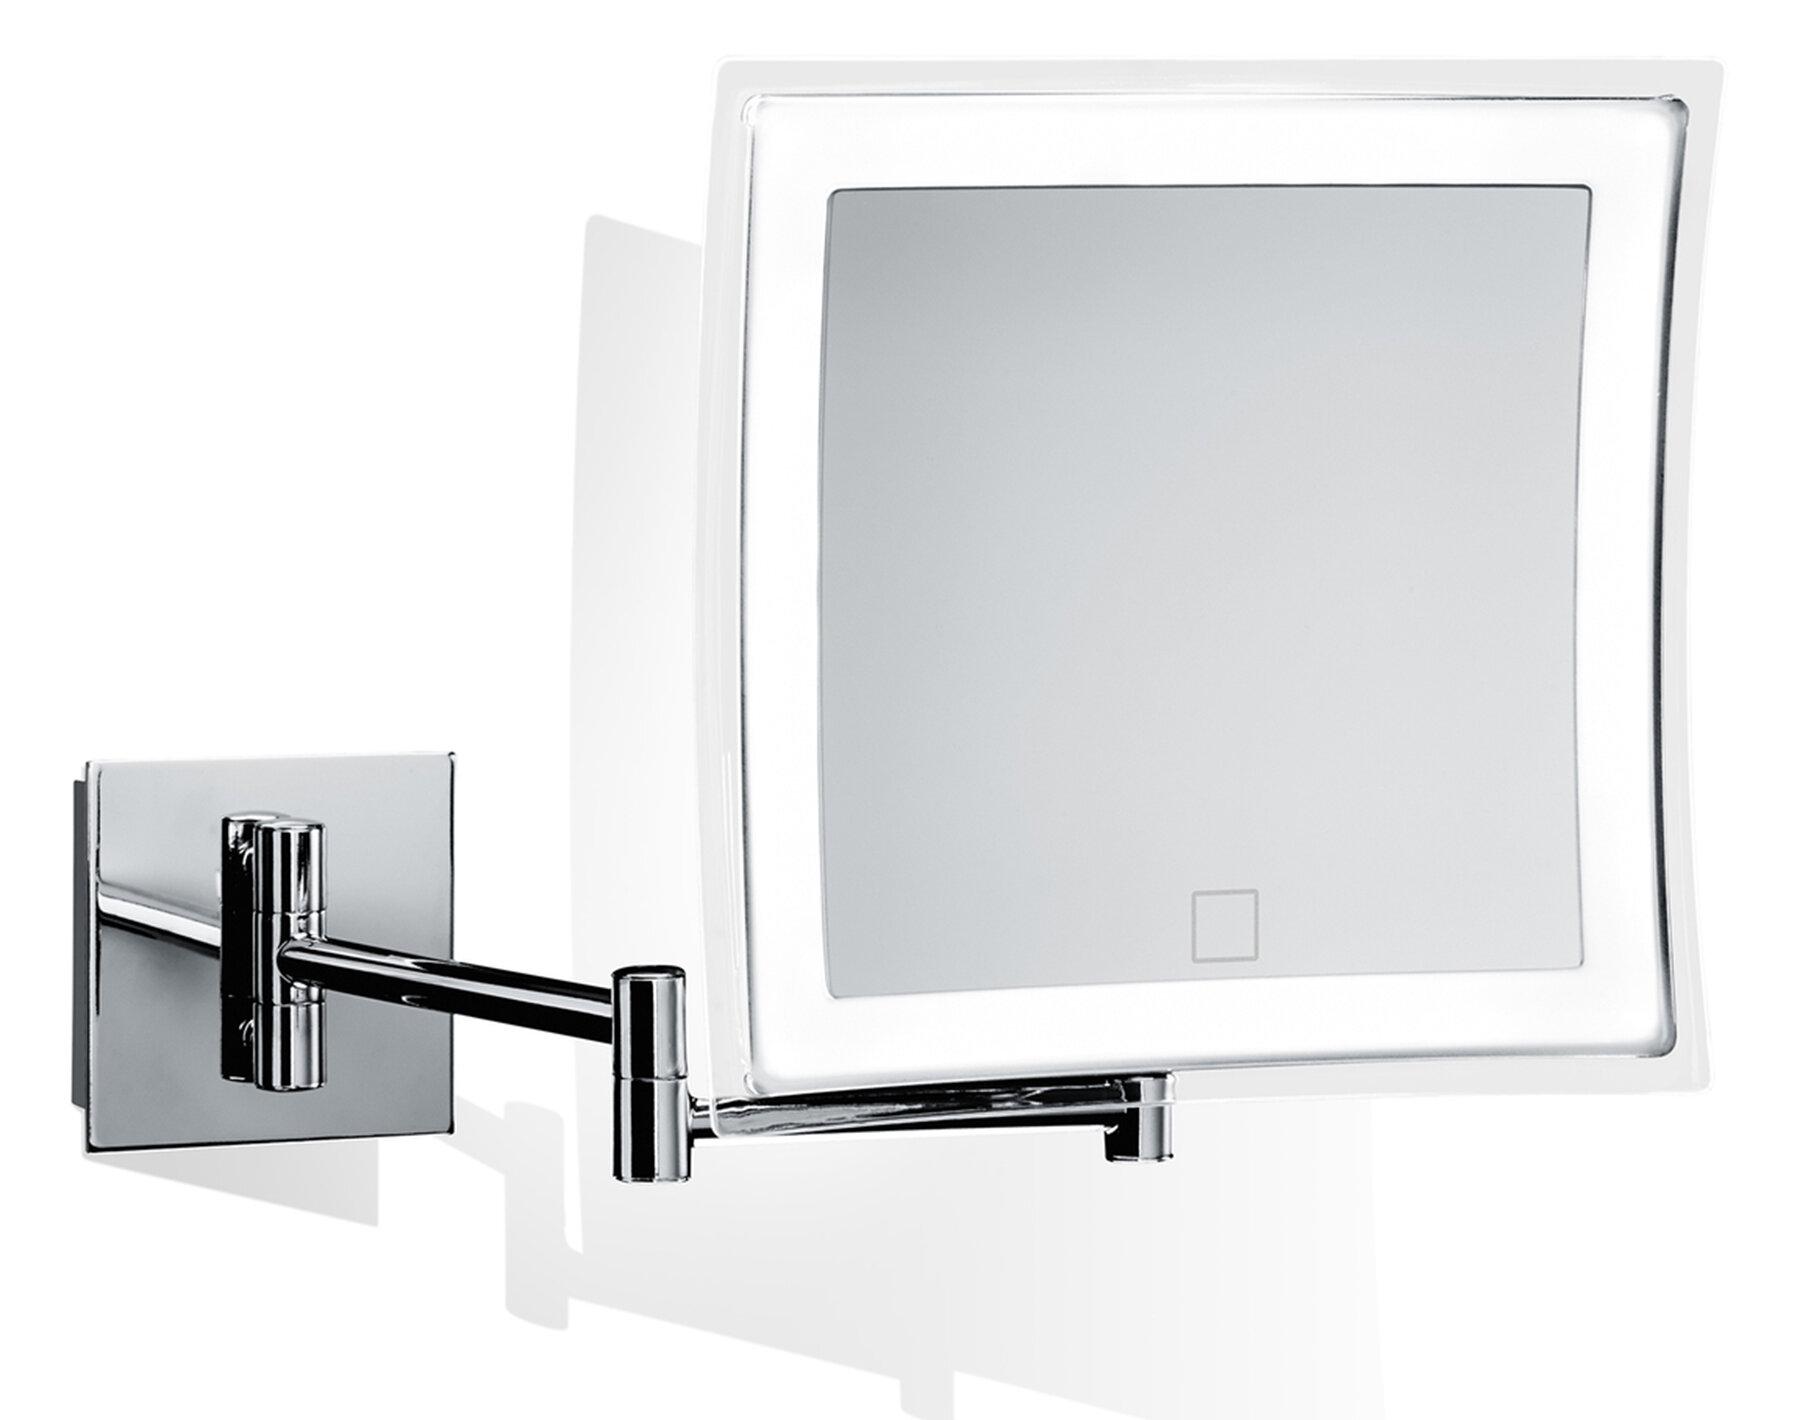 Make Up Spiegel : Ws bath collections spiegel magnifying makeup mirror wayfair